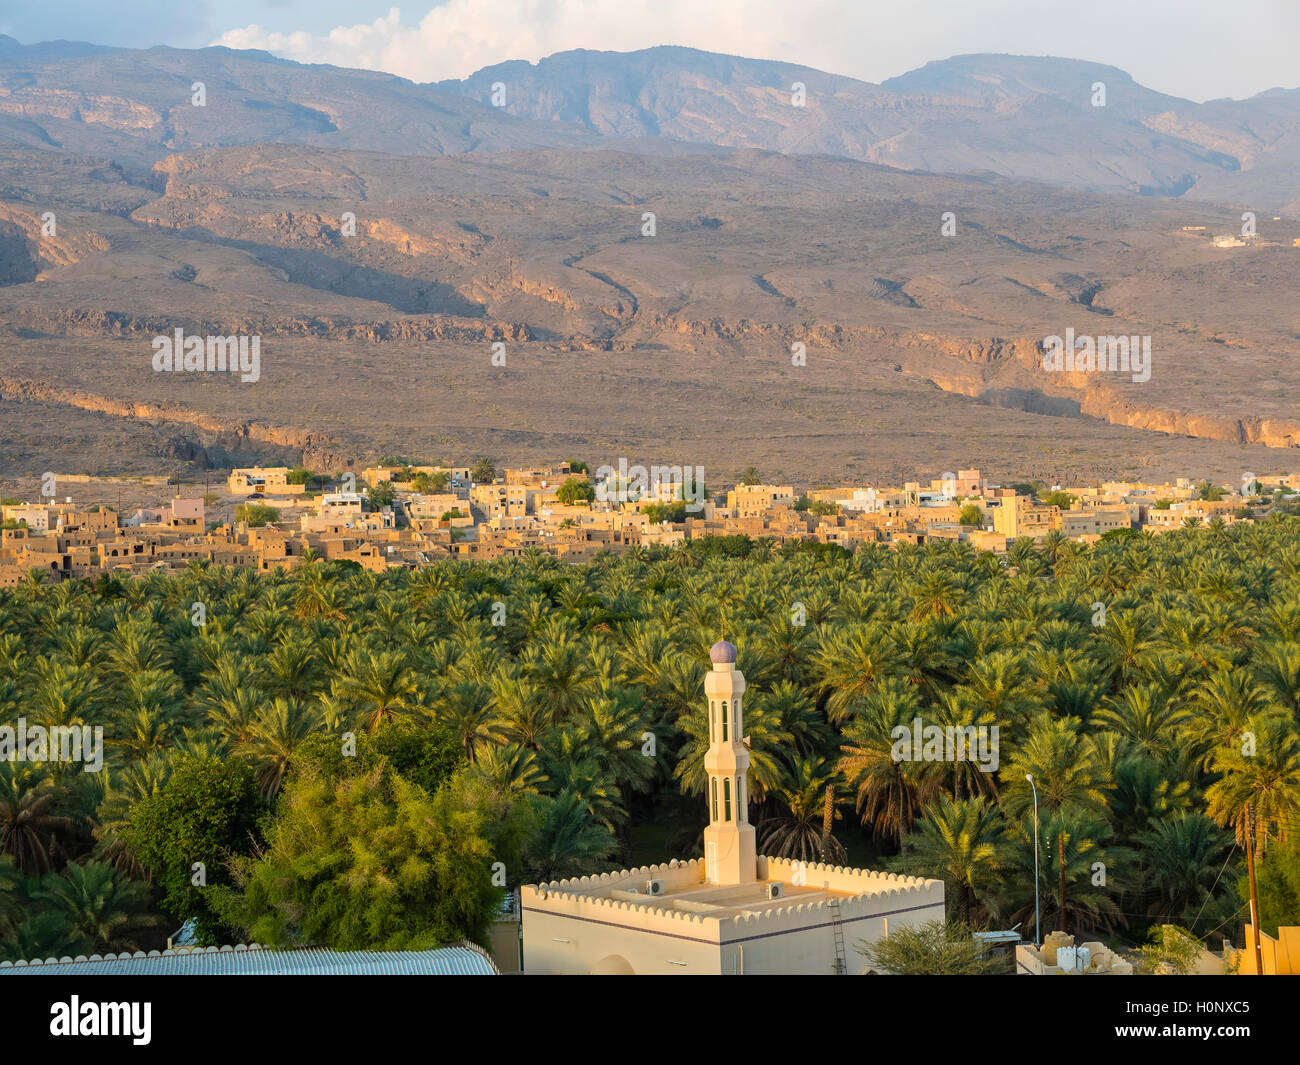 Al-Hamra, oasis in Jebel Shams, Wadi Misfah, mountain village, Al Hajar al Gharbi Mountains, Ad Dakhiliyah, Oman - Stock Image